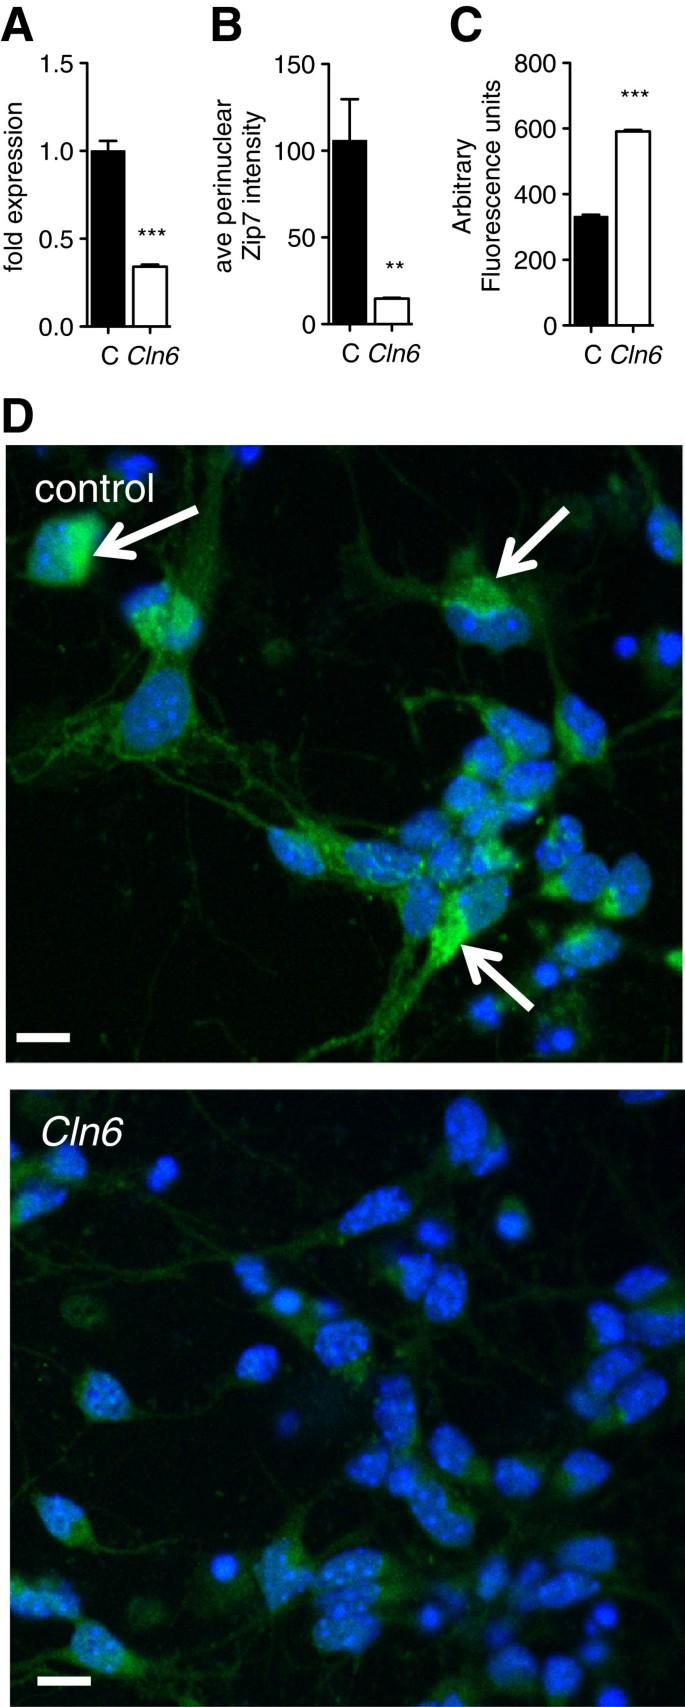 Deregulation of subcellular biometal homeostasis through